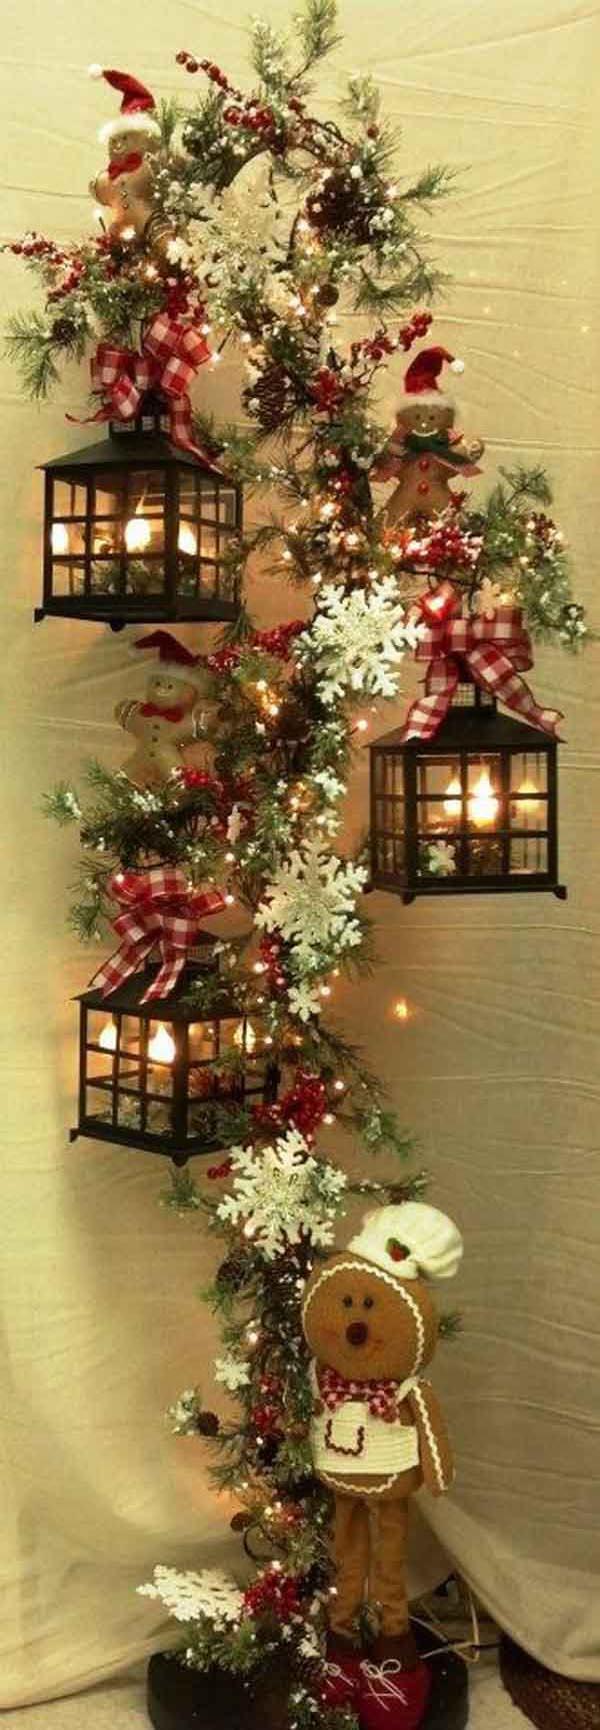 indoor-christmas-decorations-03